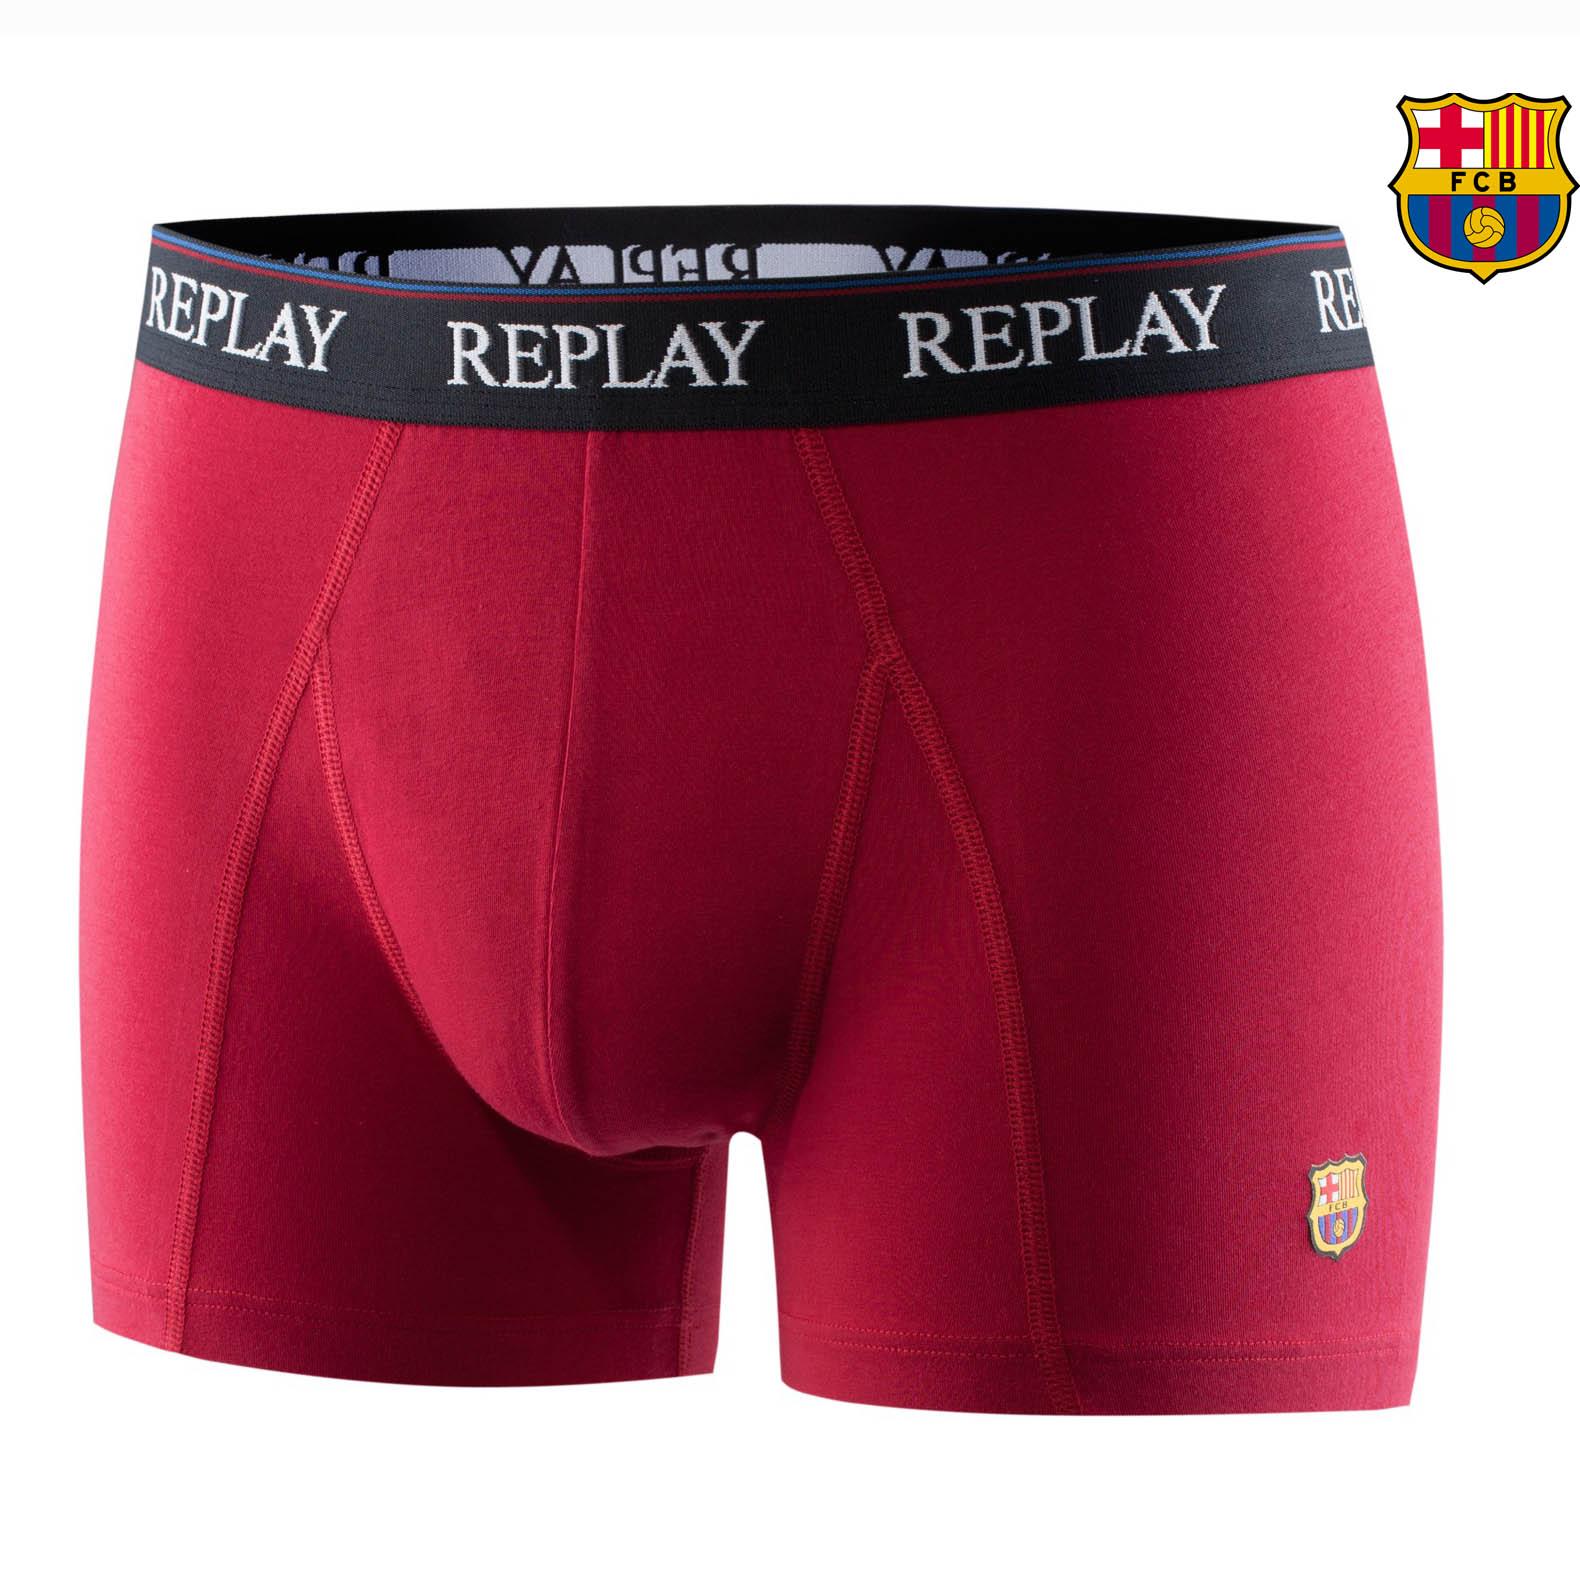 Boxer Replay M251143